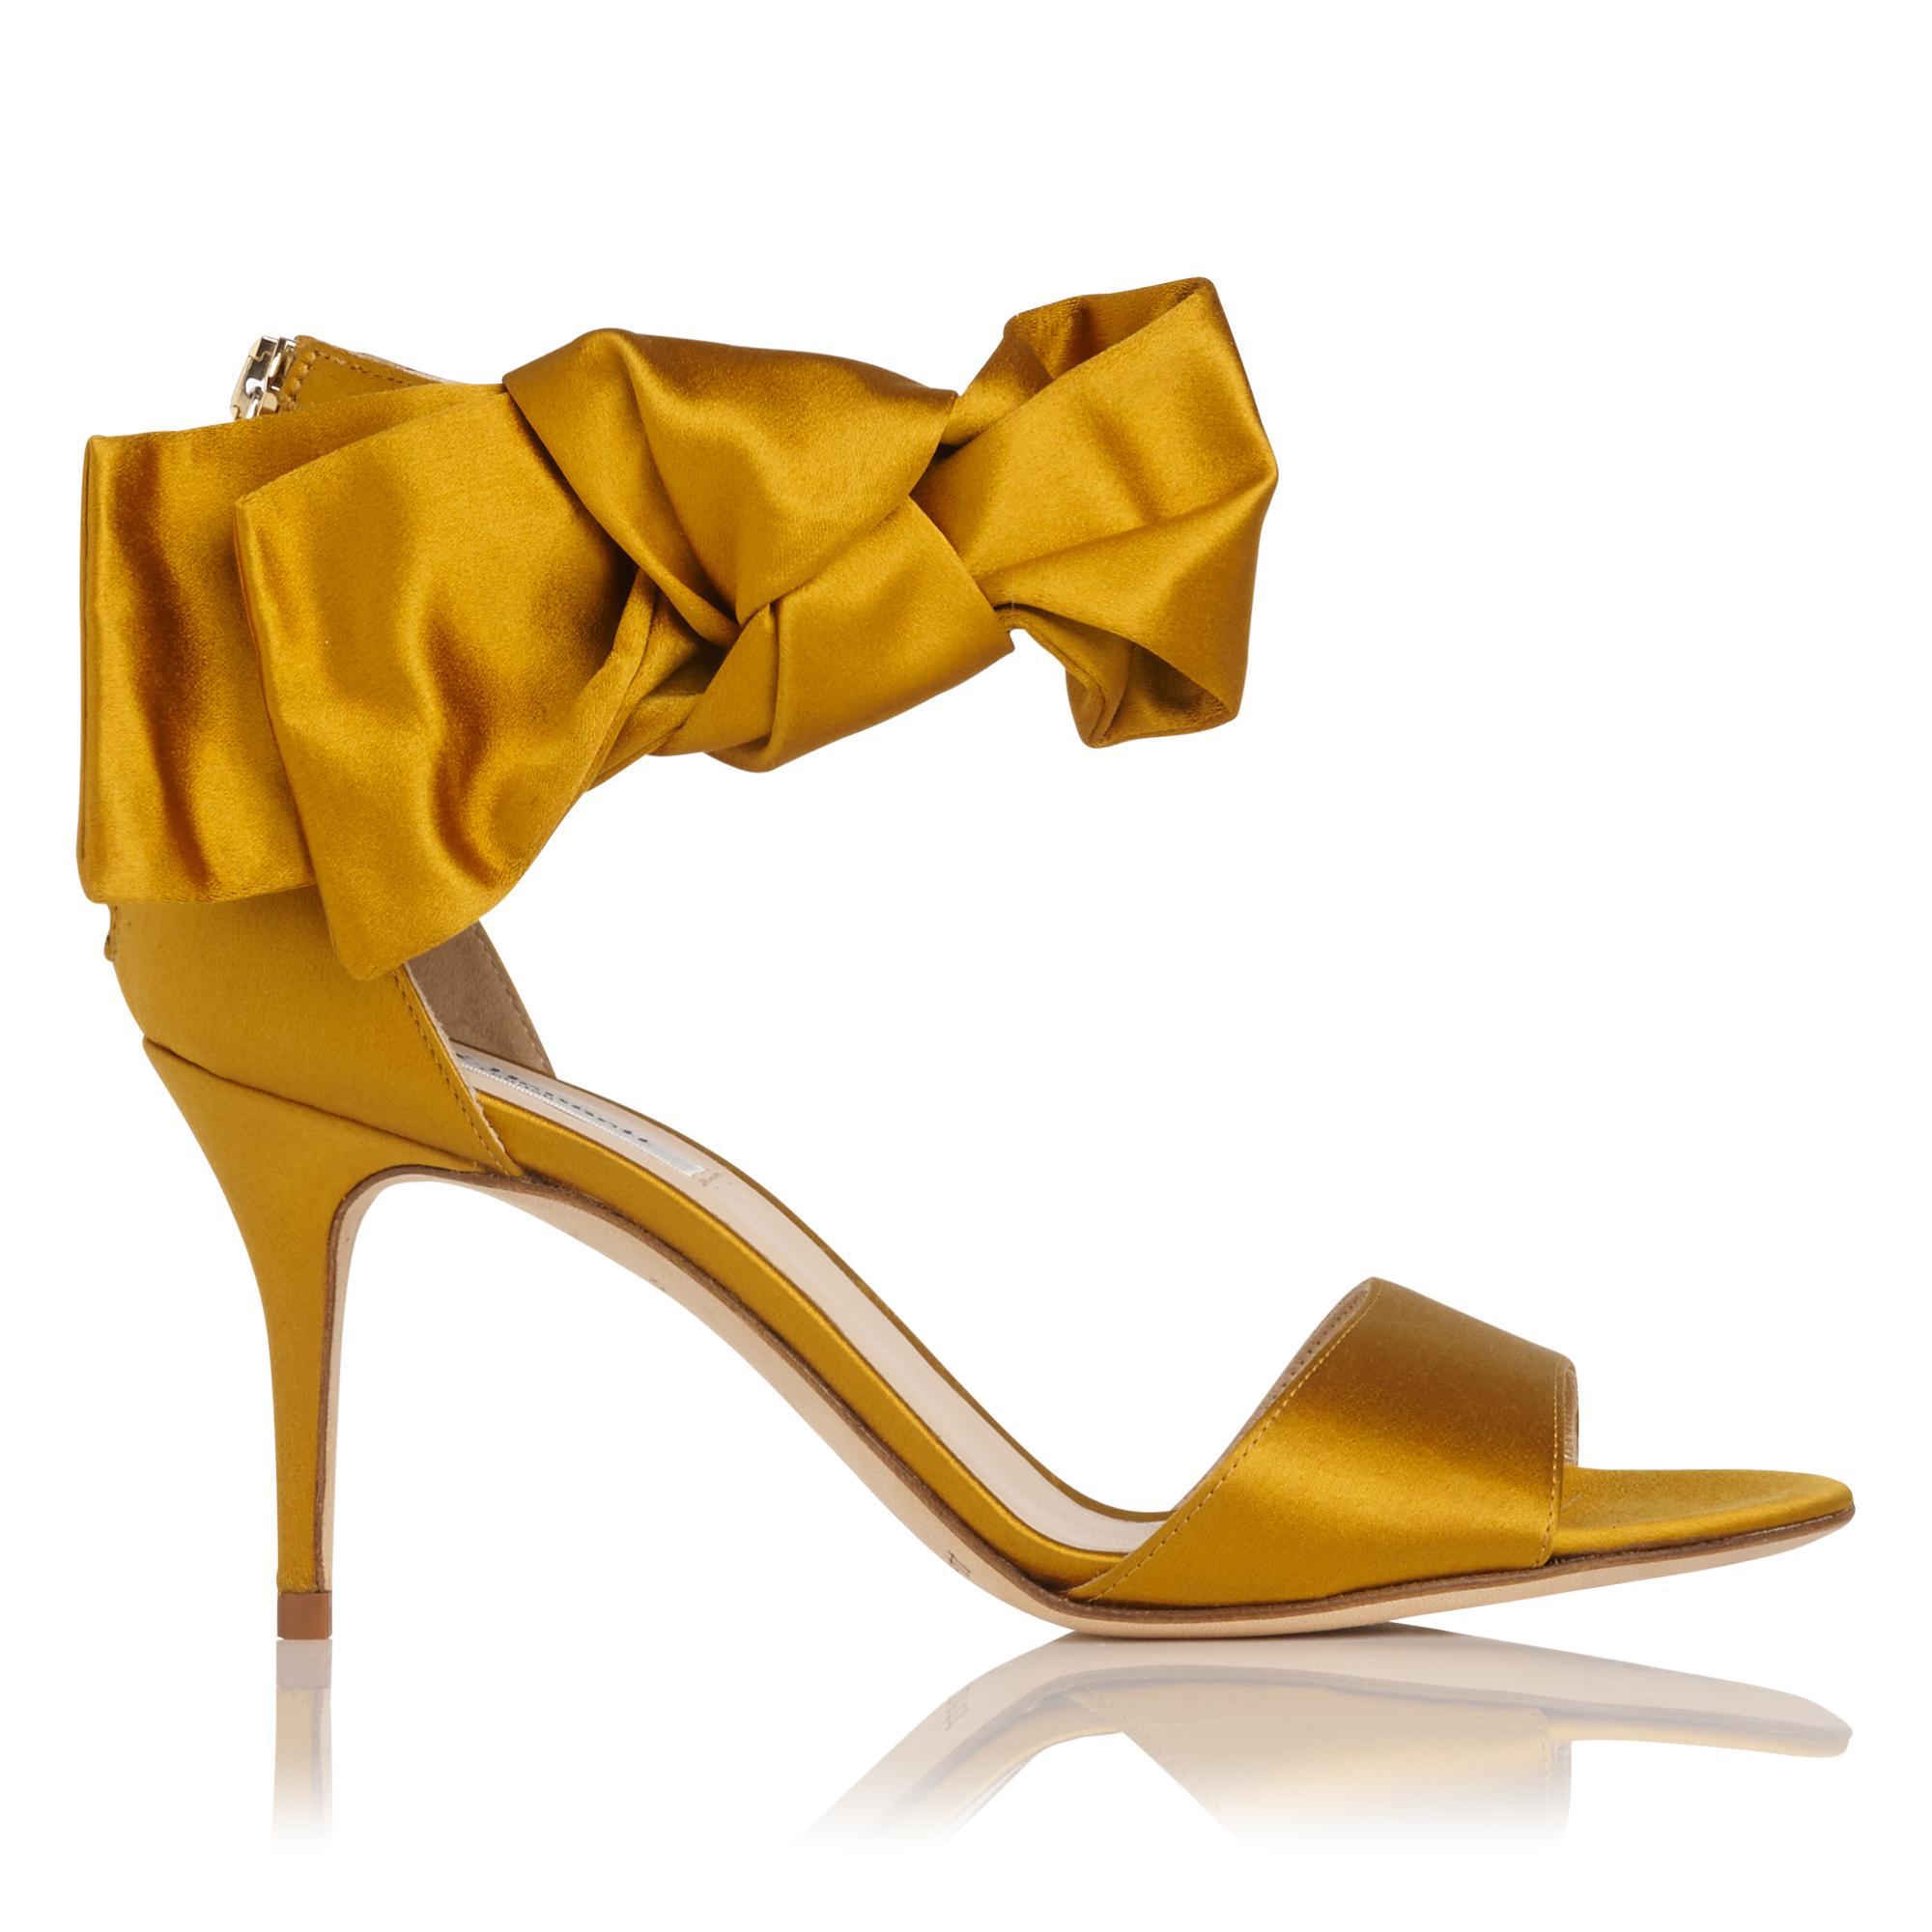 Agata Gold Satin Sandal